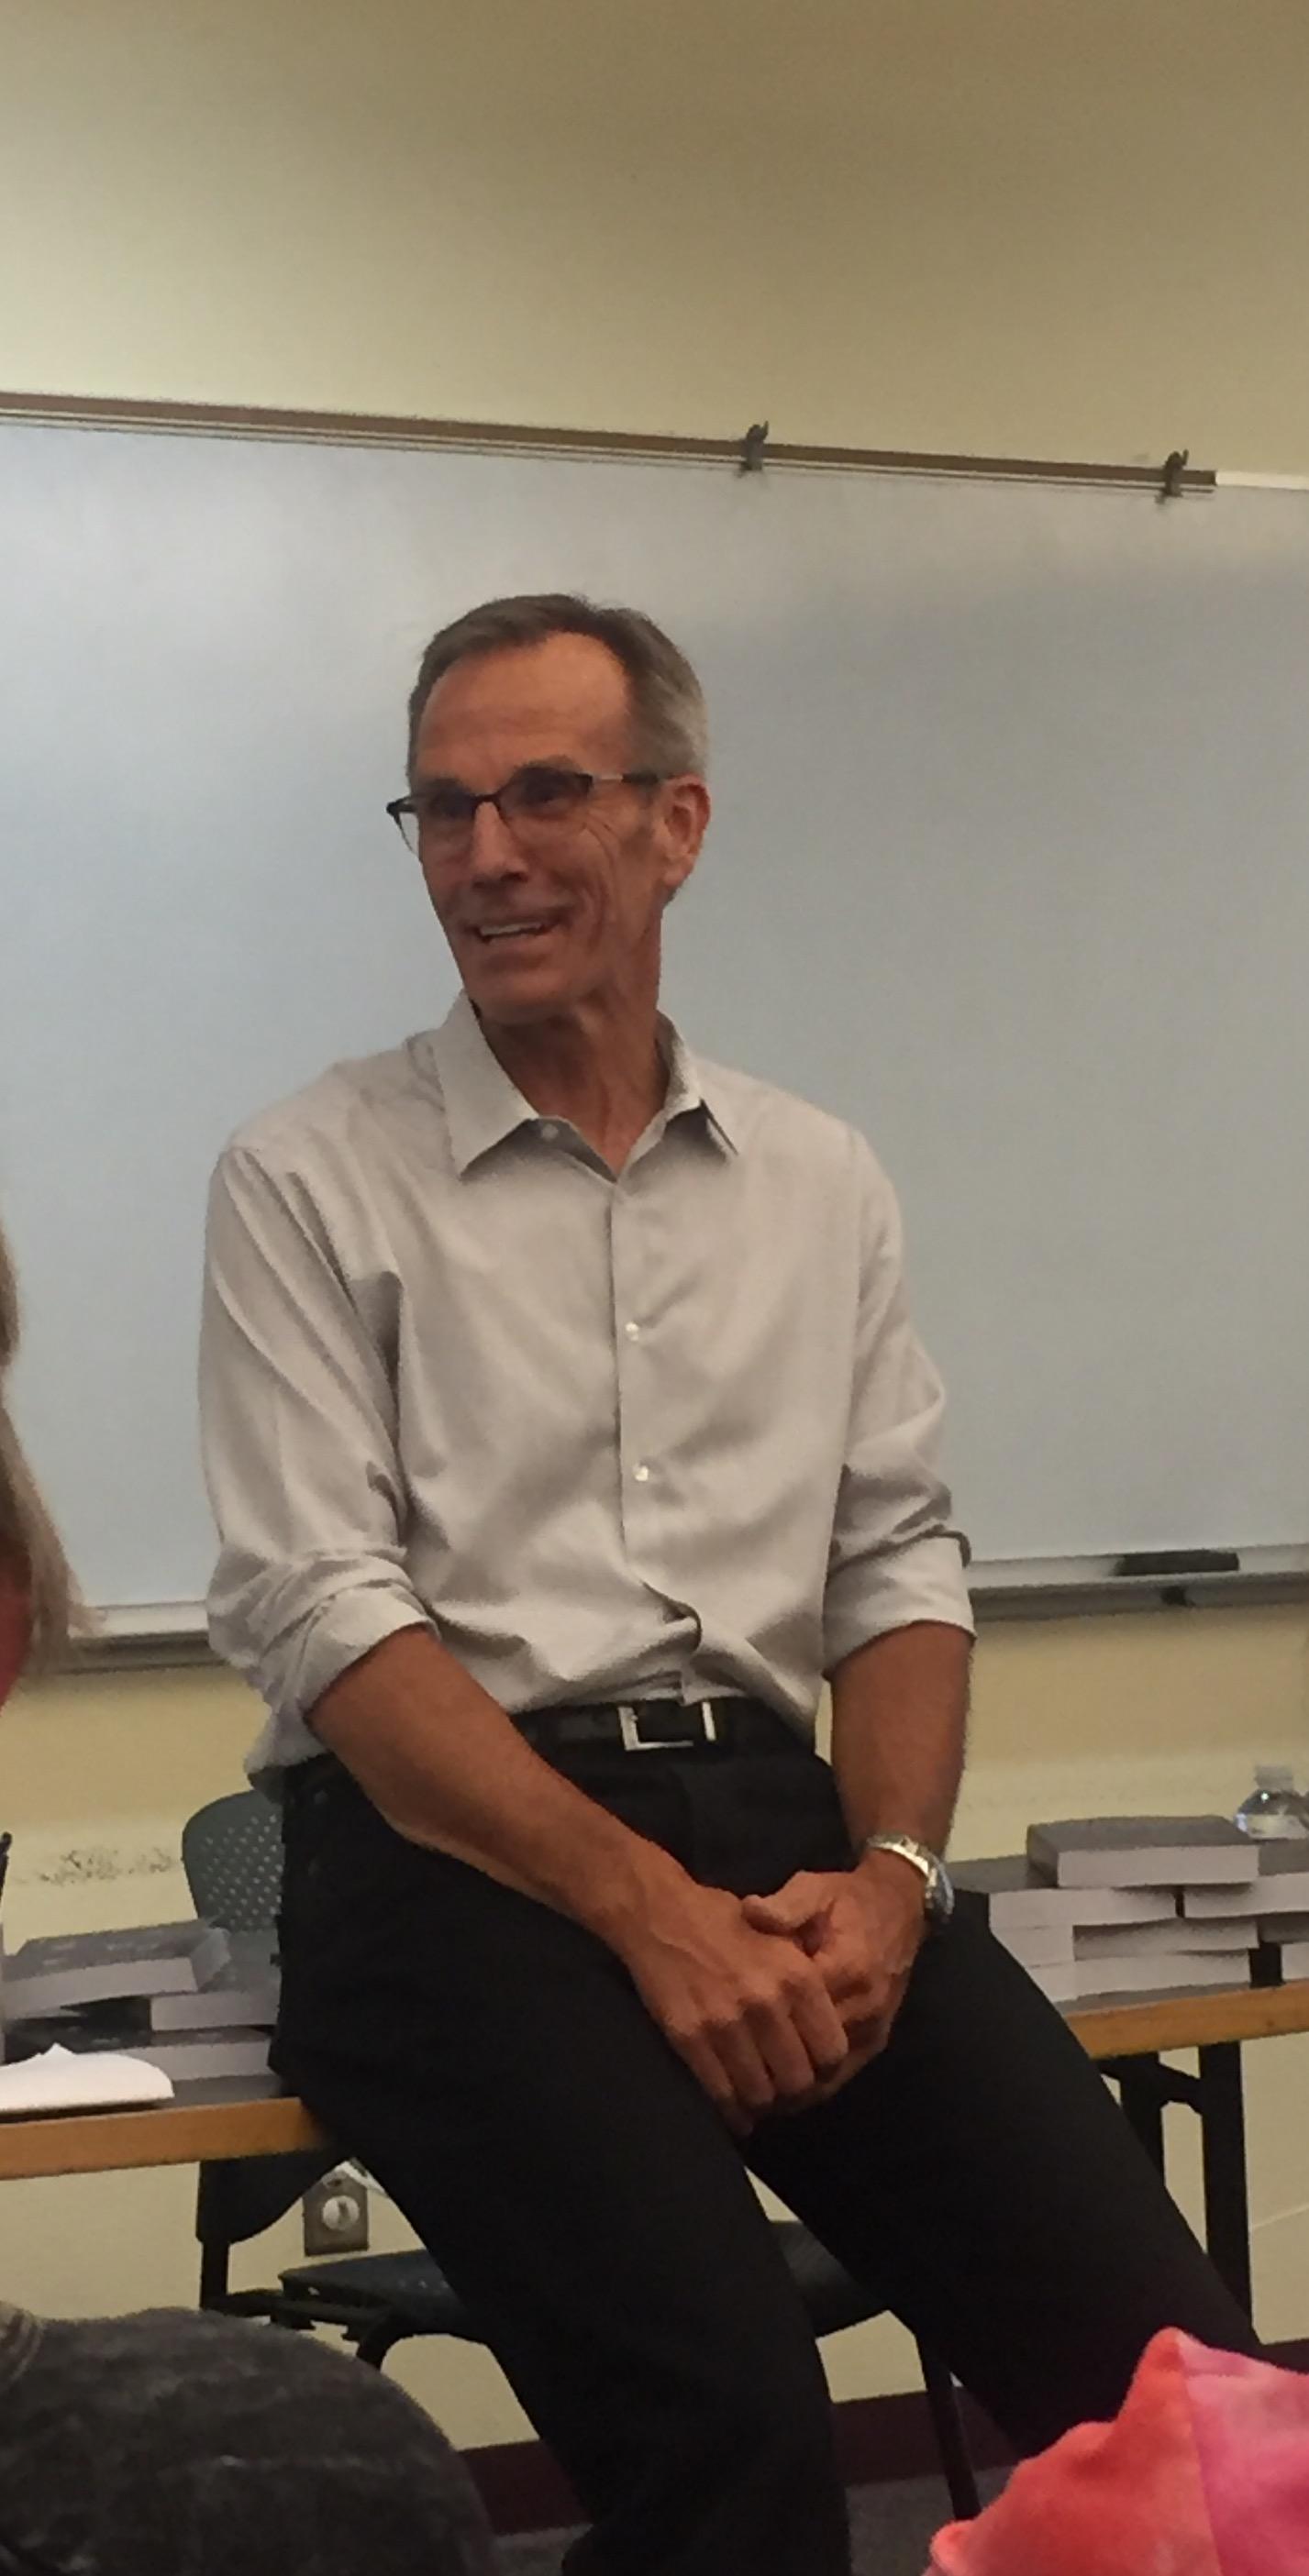 Author Phil Robins